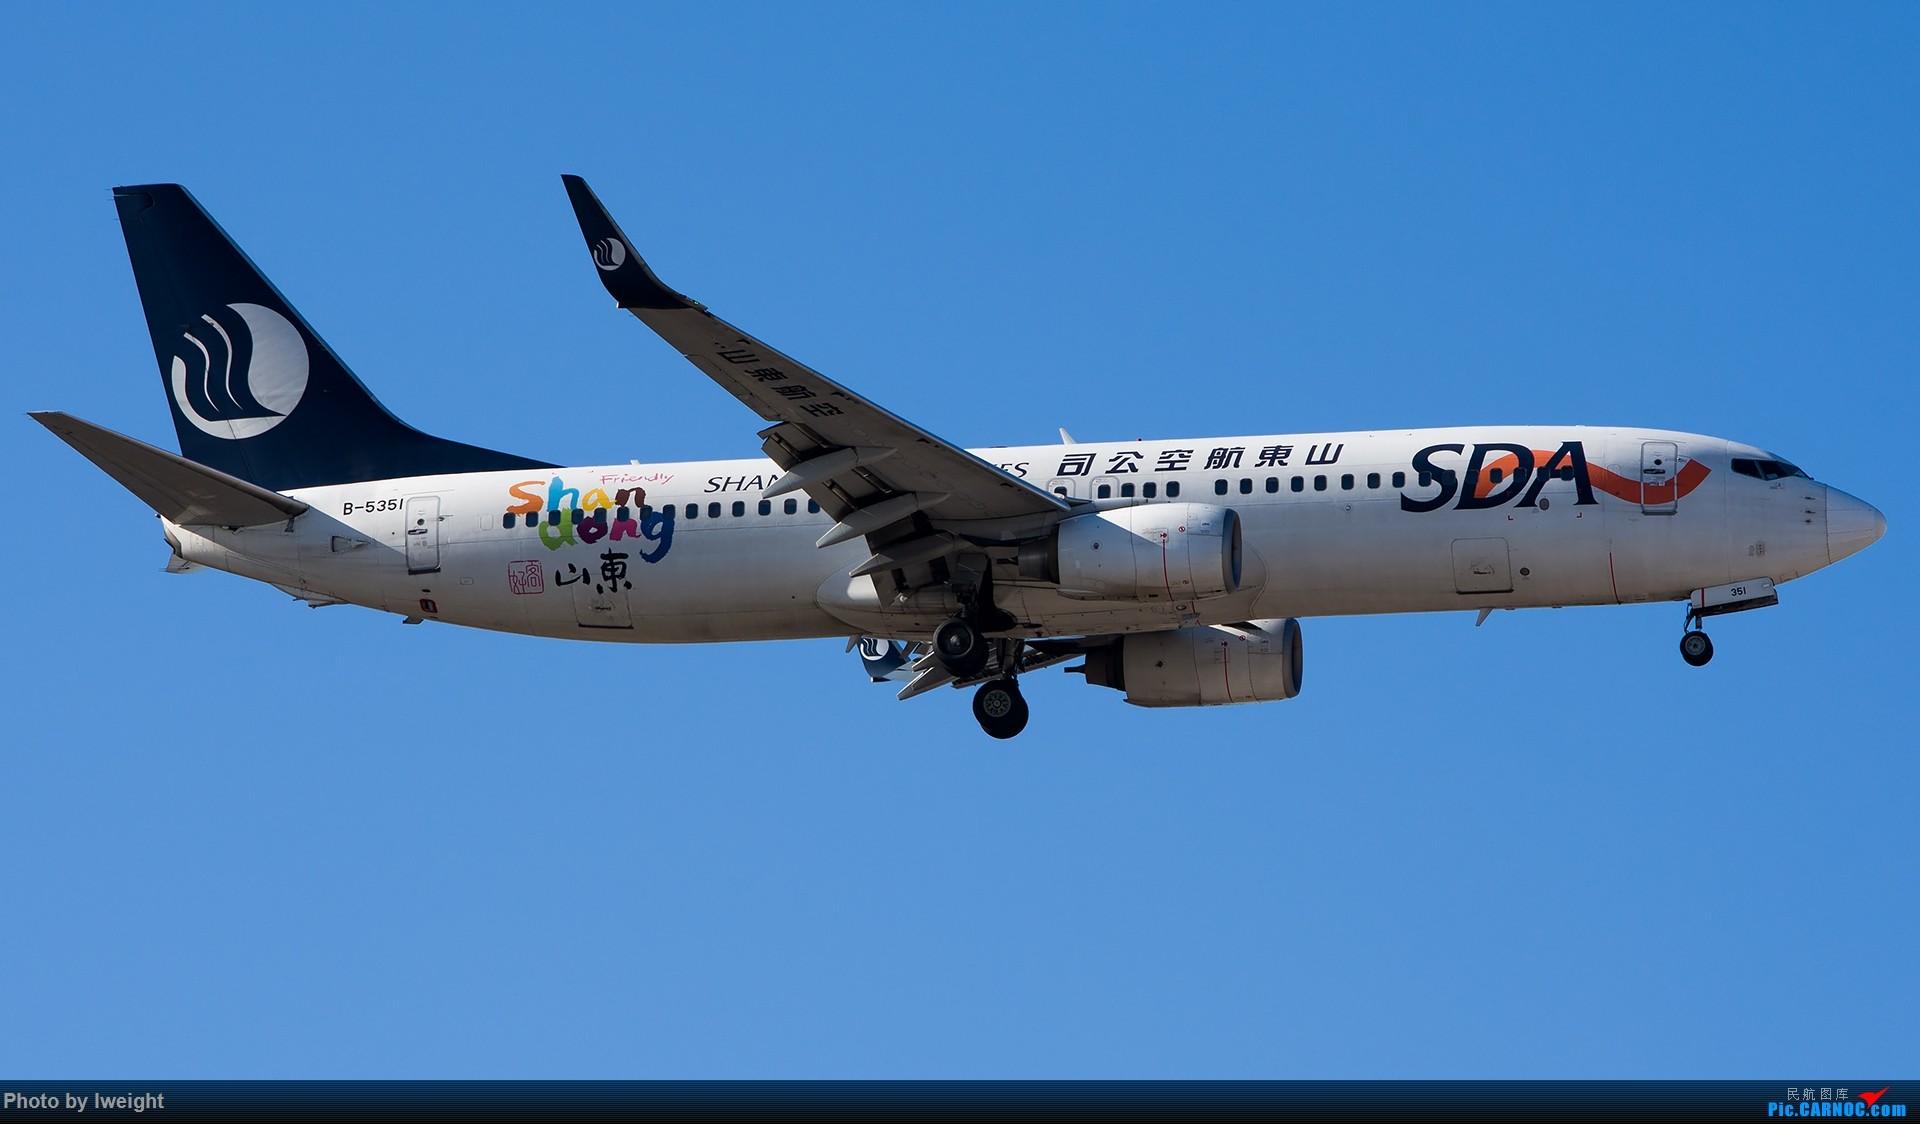 Re:[原创]终于在12月的北京等到了一个晴天的周末,出来拍拍飞机【2015-12-5】 BOEING 737-800 B-5351 中国北京首都国际机场